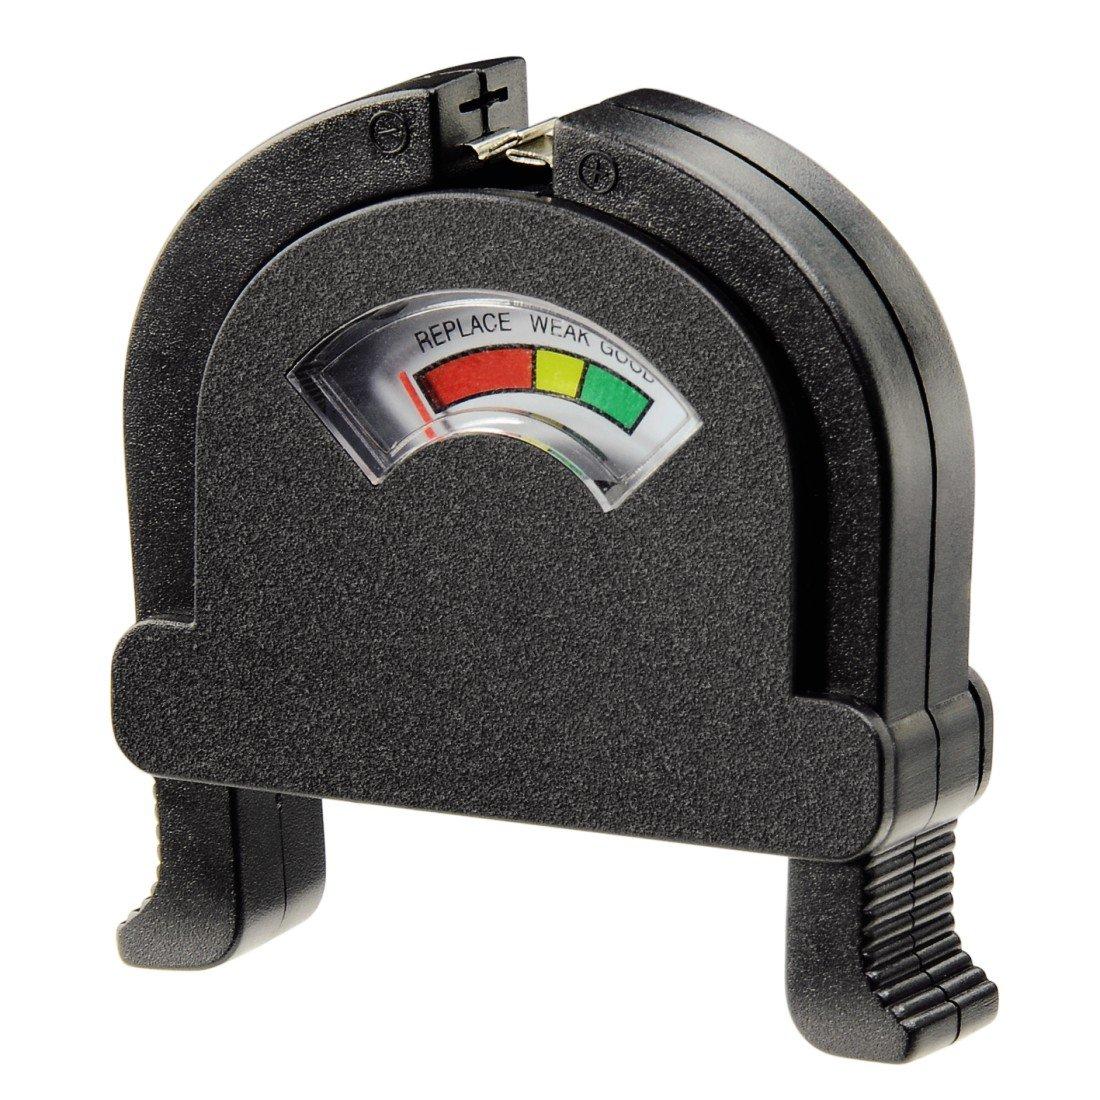 HAMA Tester per batterie alkaline e ricaricabili, AA/AAA/Pile a bottone/C/D/E